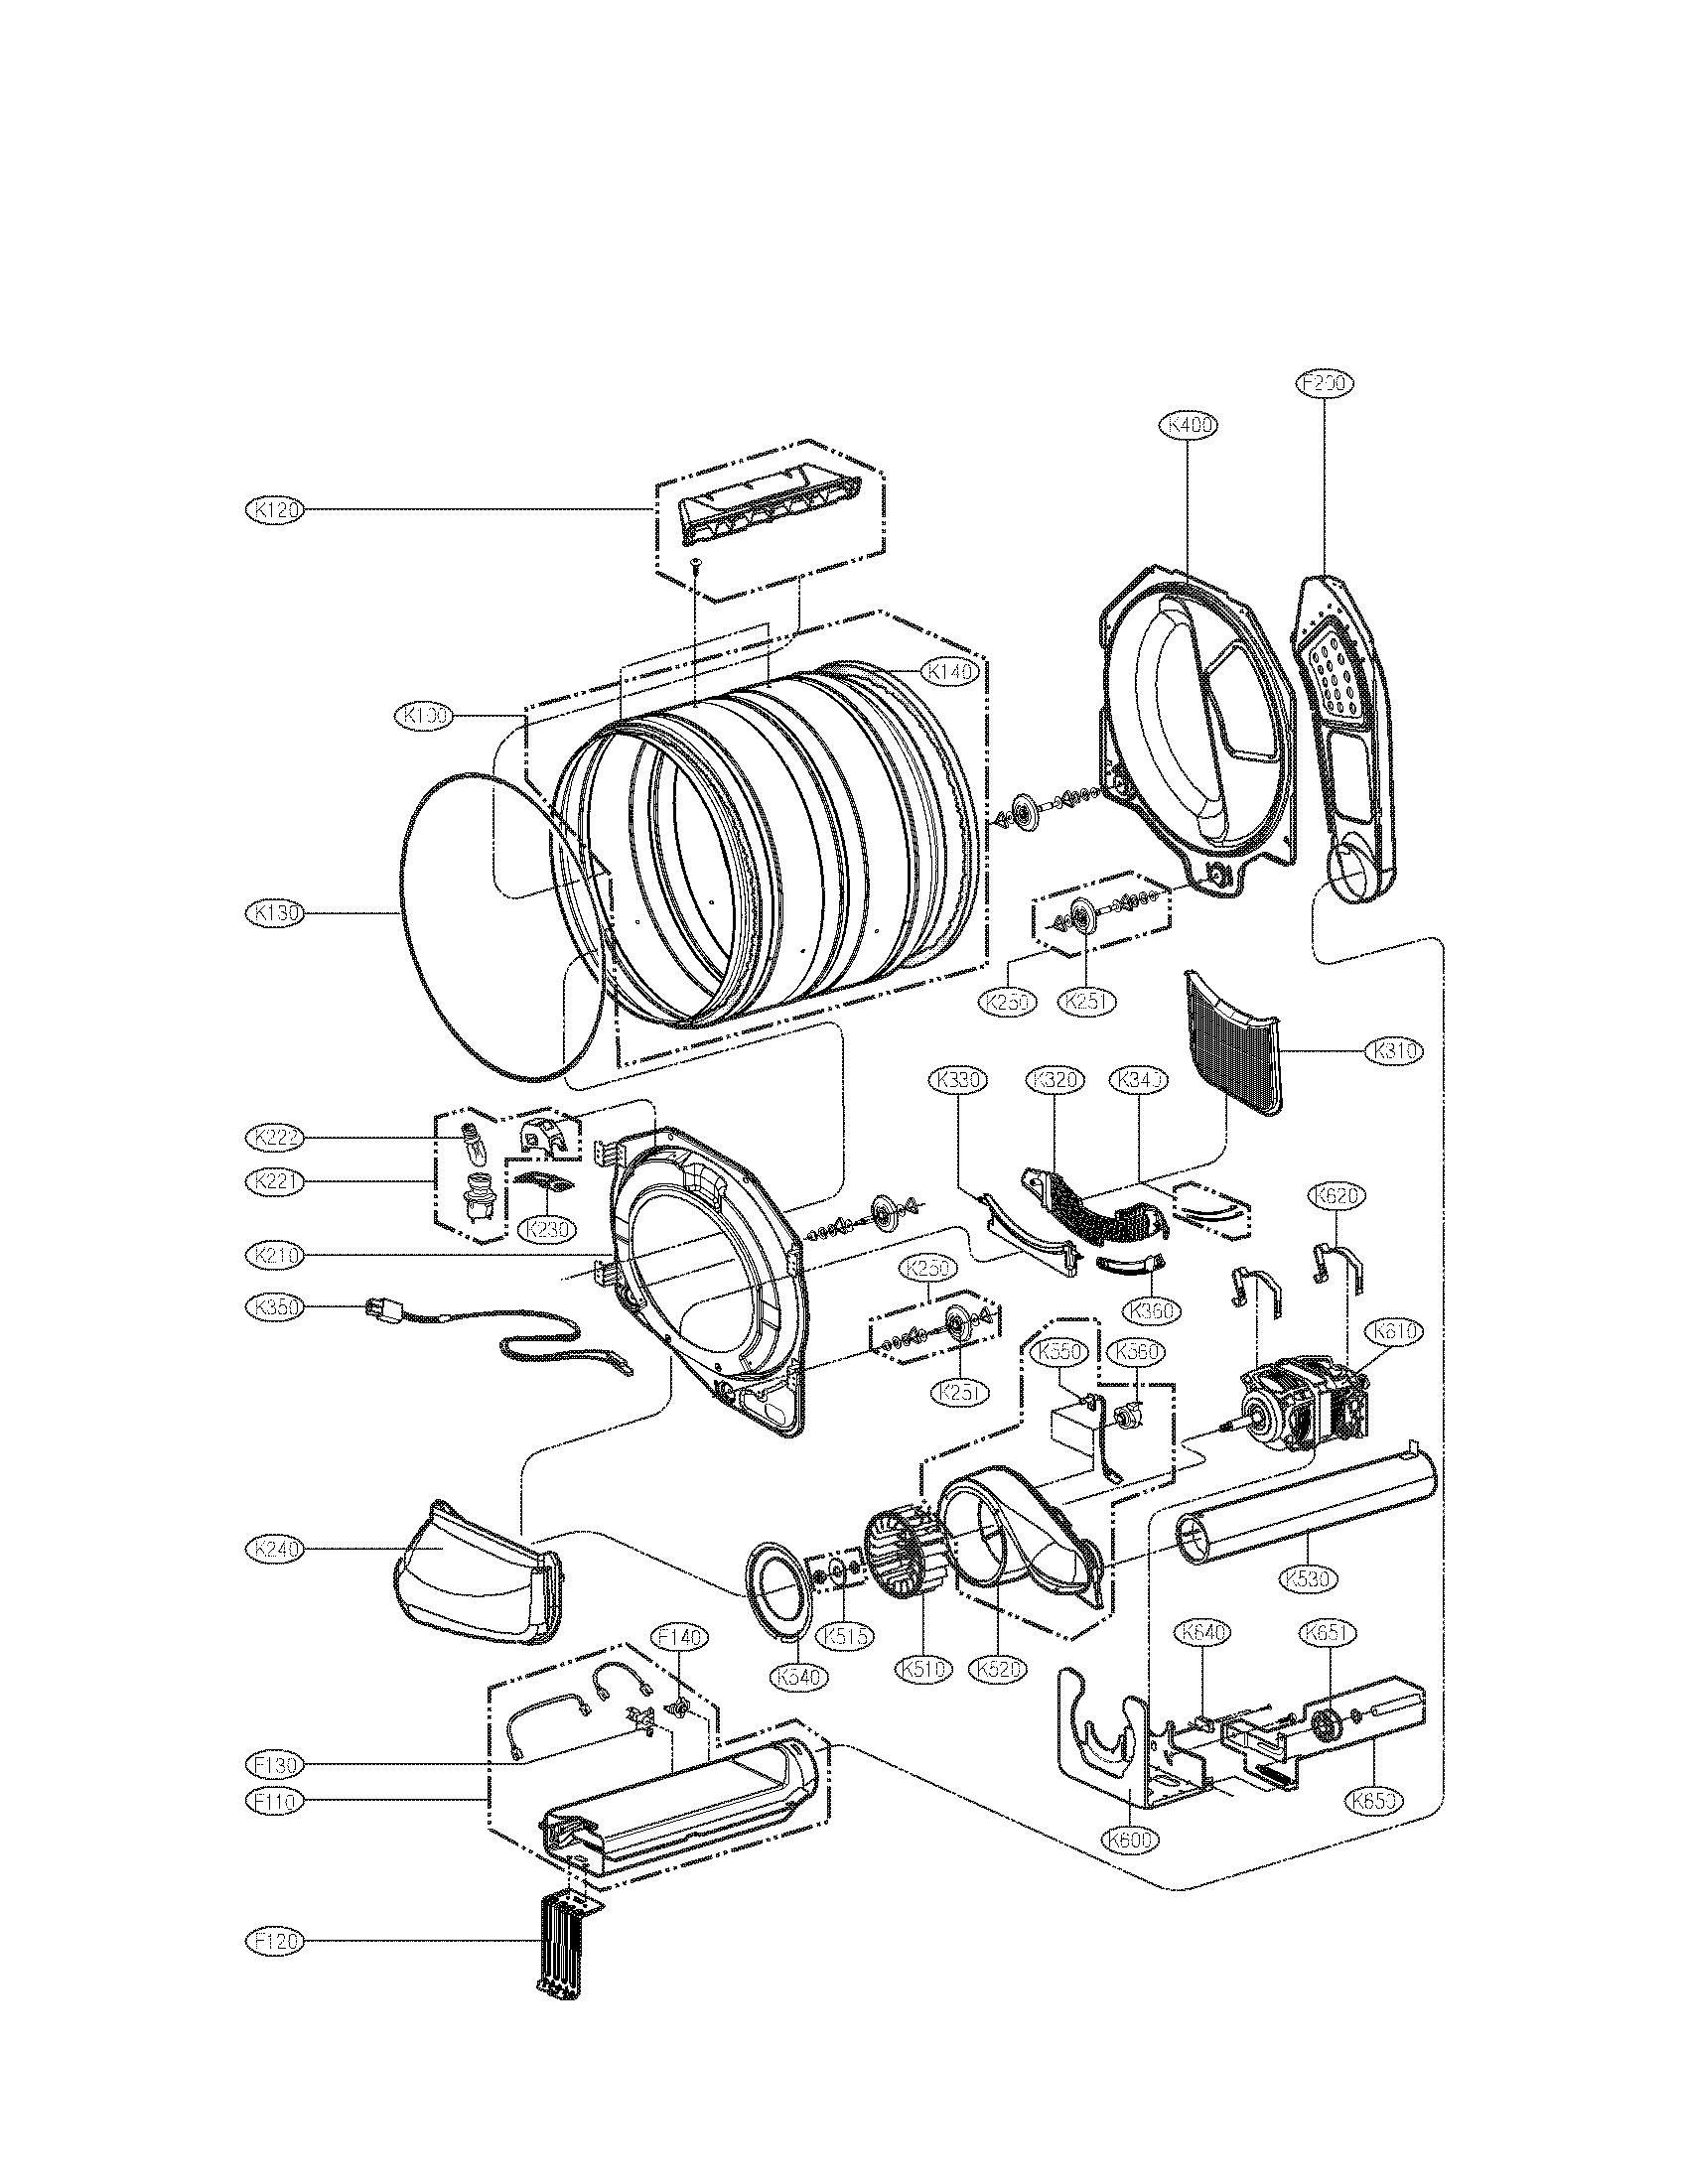 Lg model DLG3788W residential dryer genuine parts